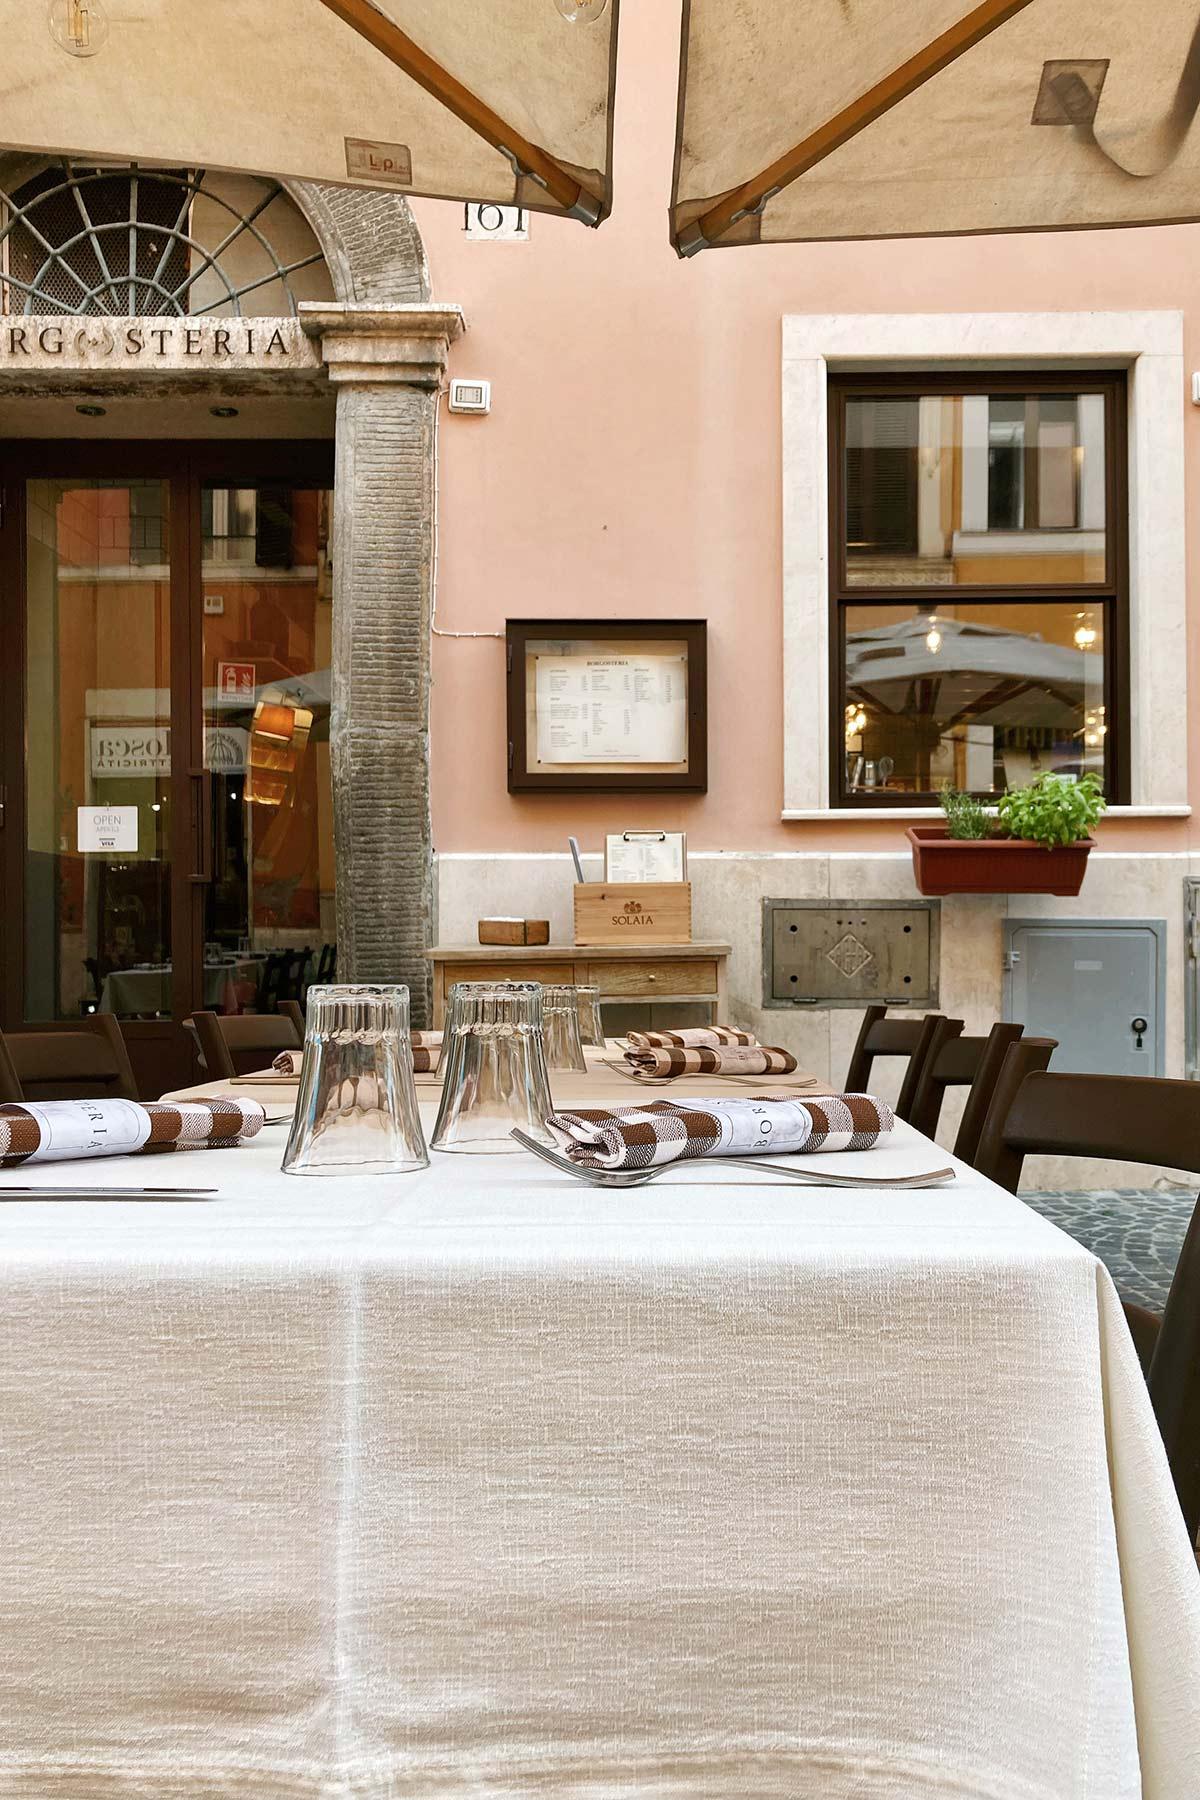 Borgo Pio, ristorante